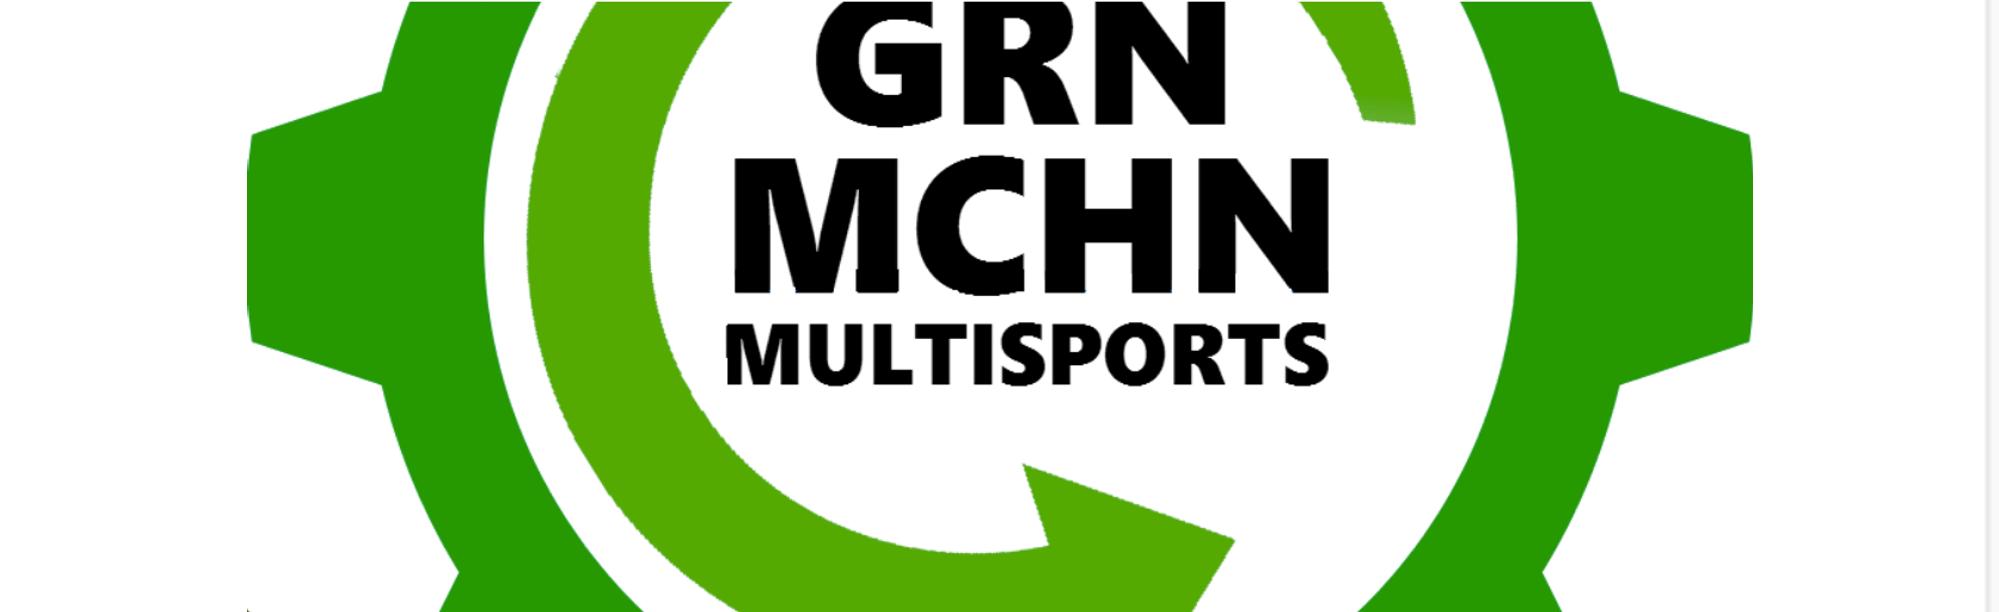 Grn Mchn Multisport Triathlon 2020